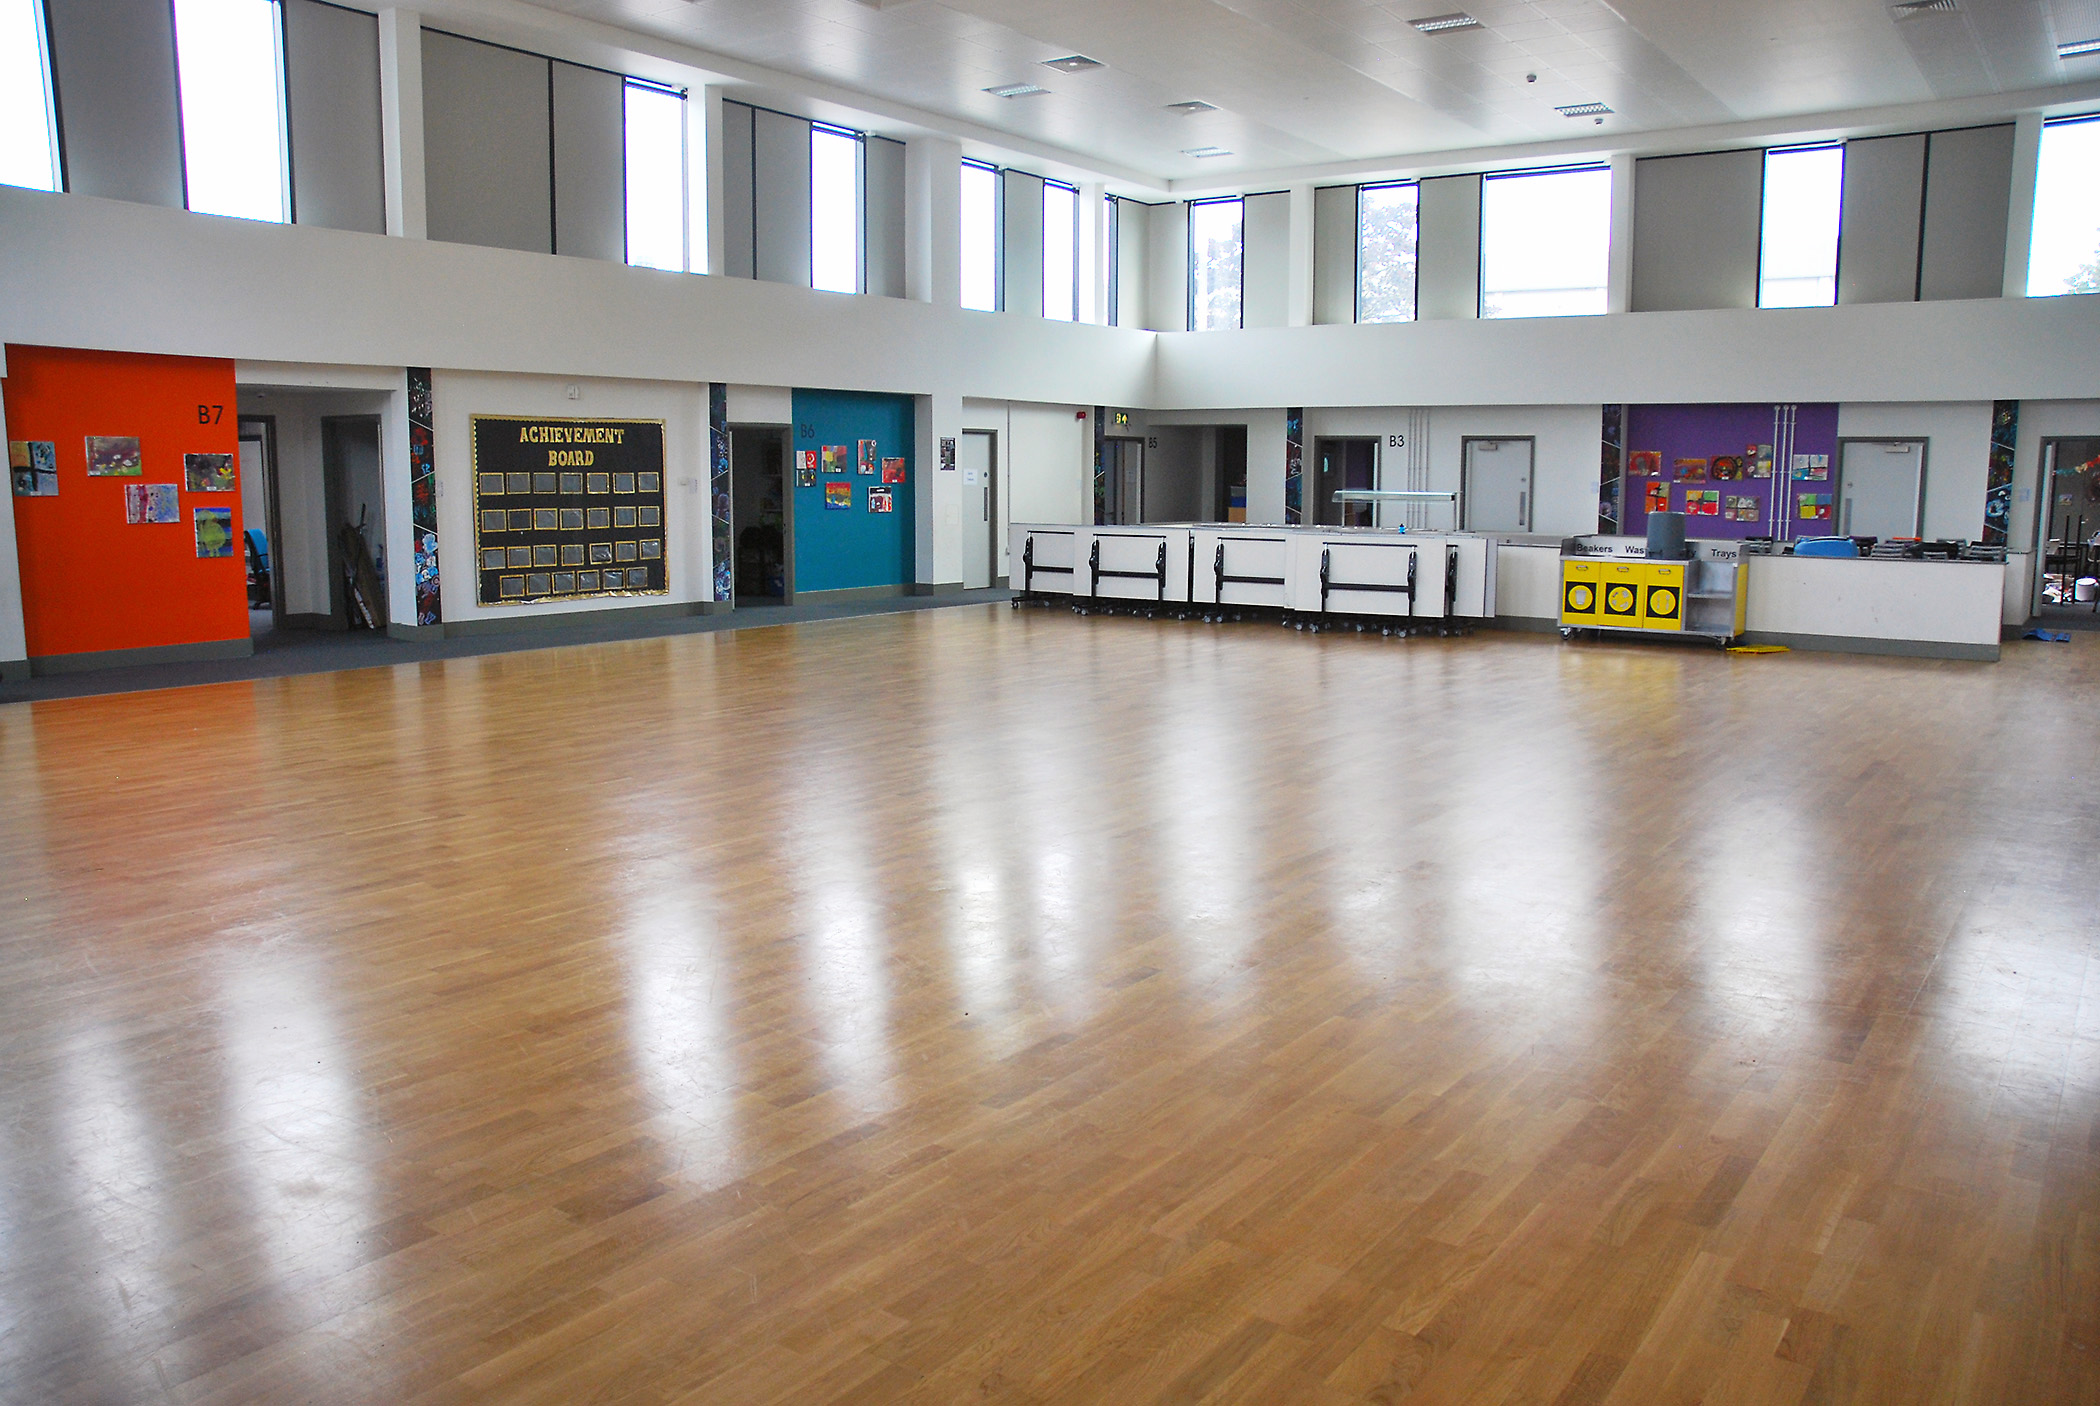 Primary Hall